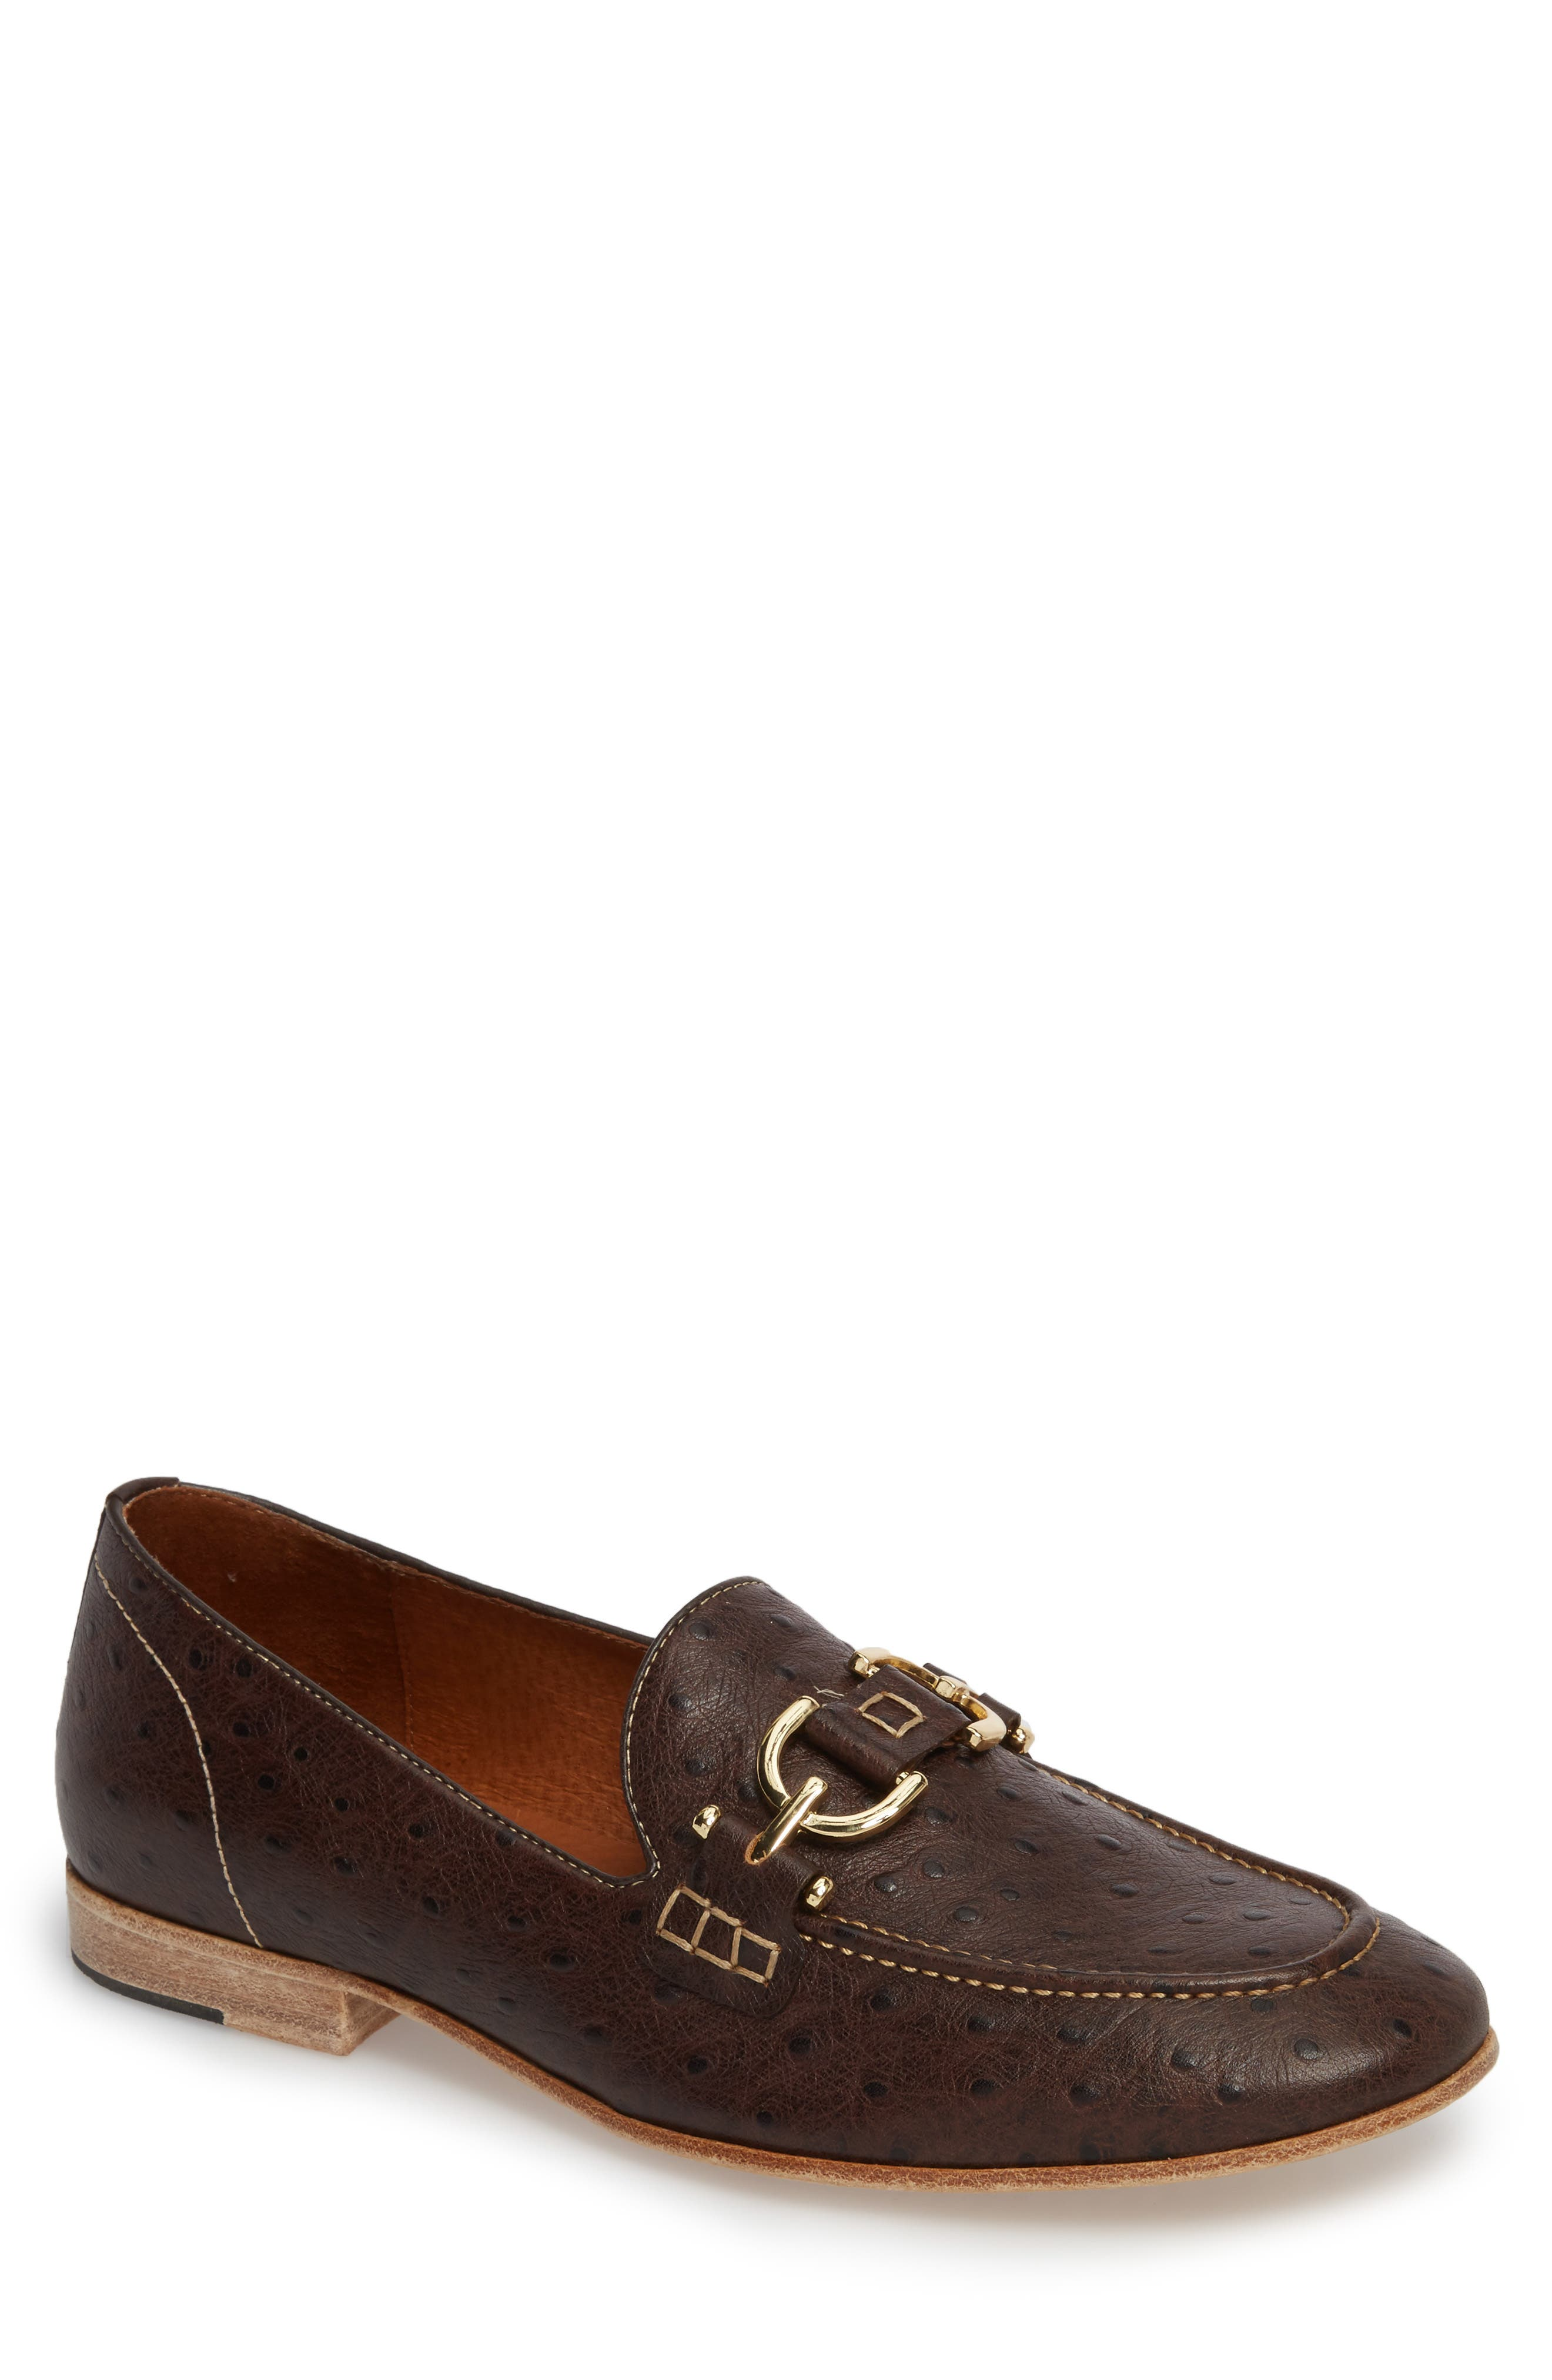 Moritz Apron Toe Bit Loafer,                         Main,                         color, Brown Leather